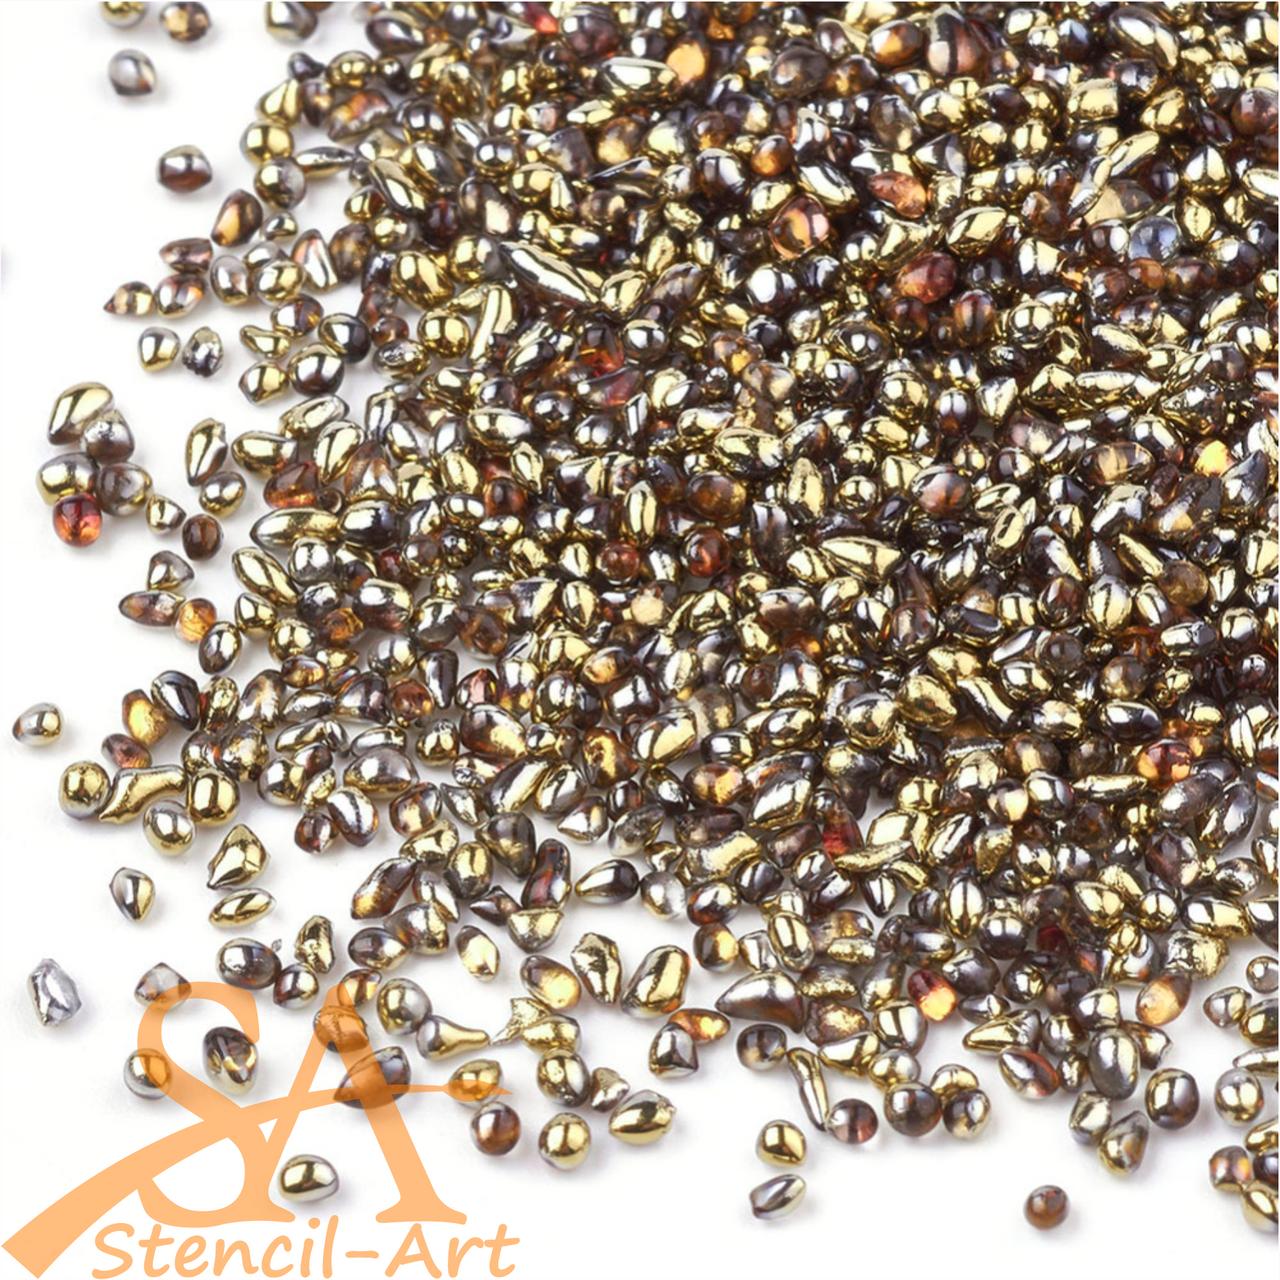 Small Irregular Glass Pebbles Dark Gold 50g